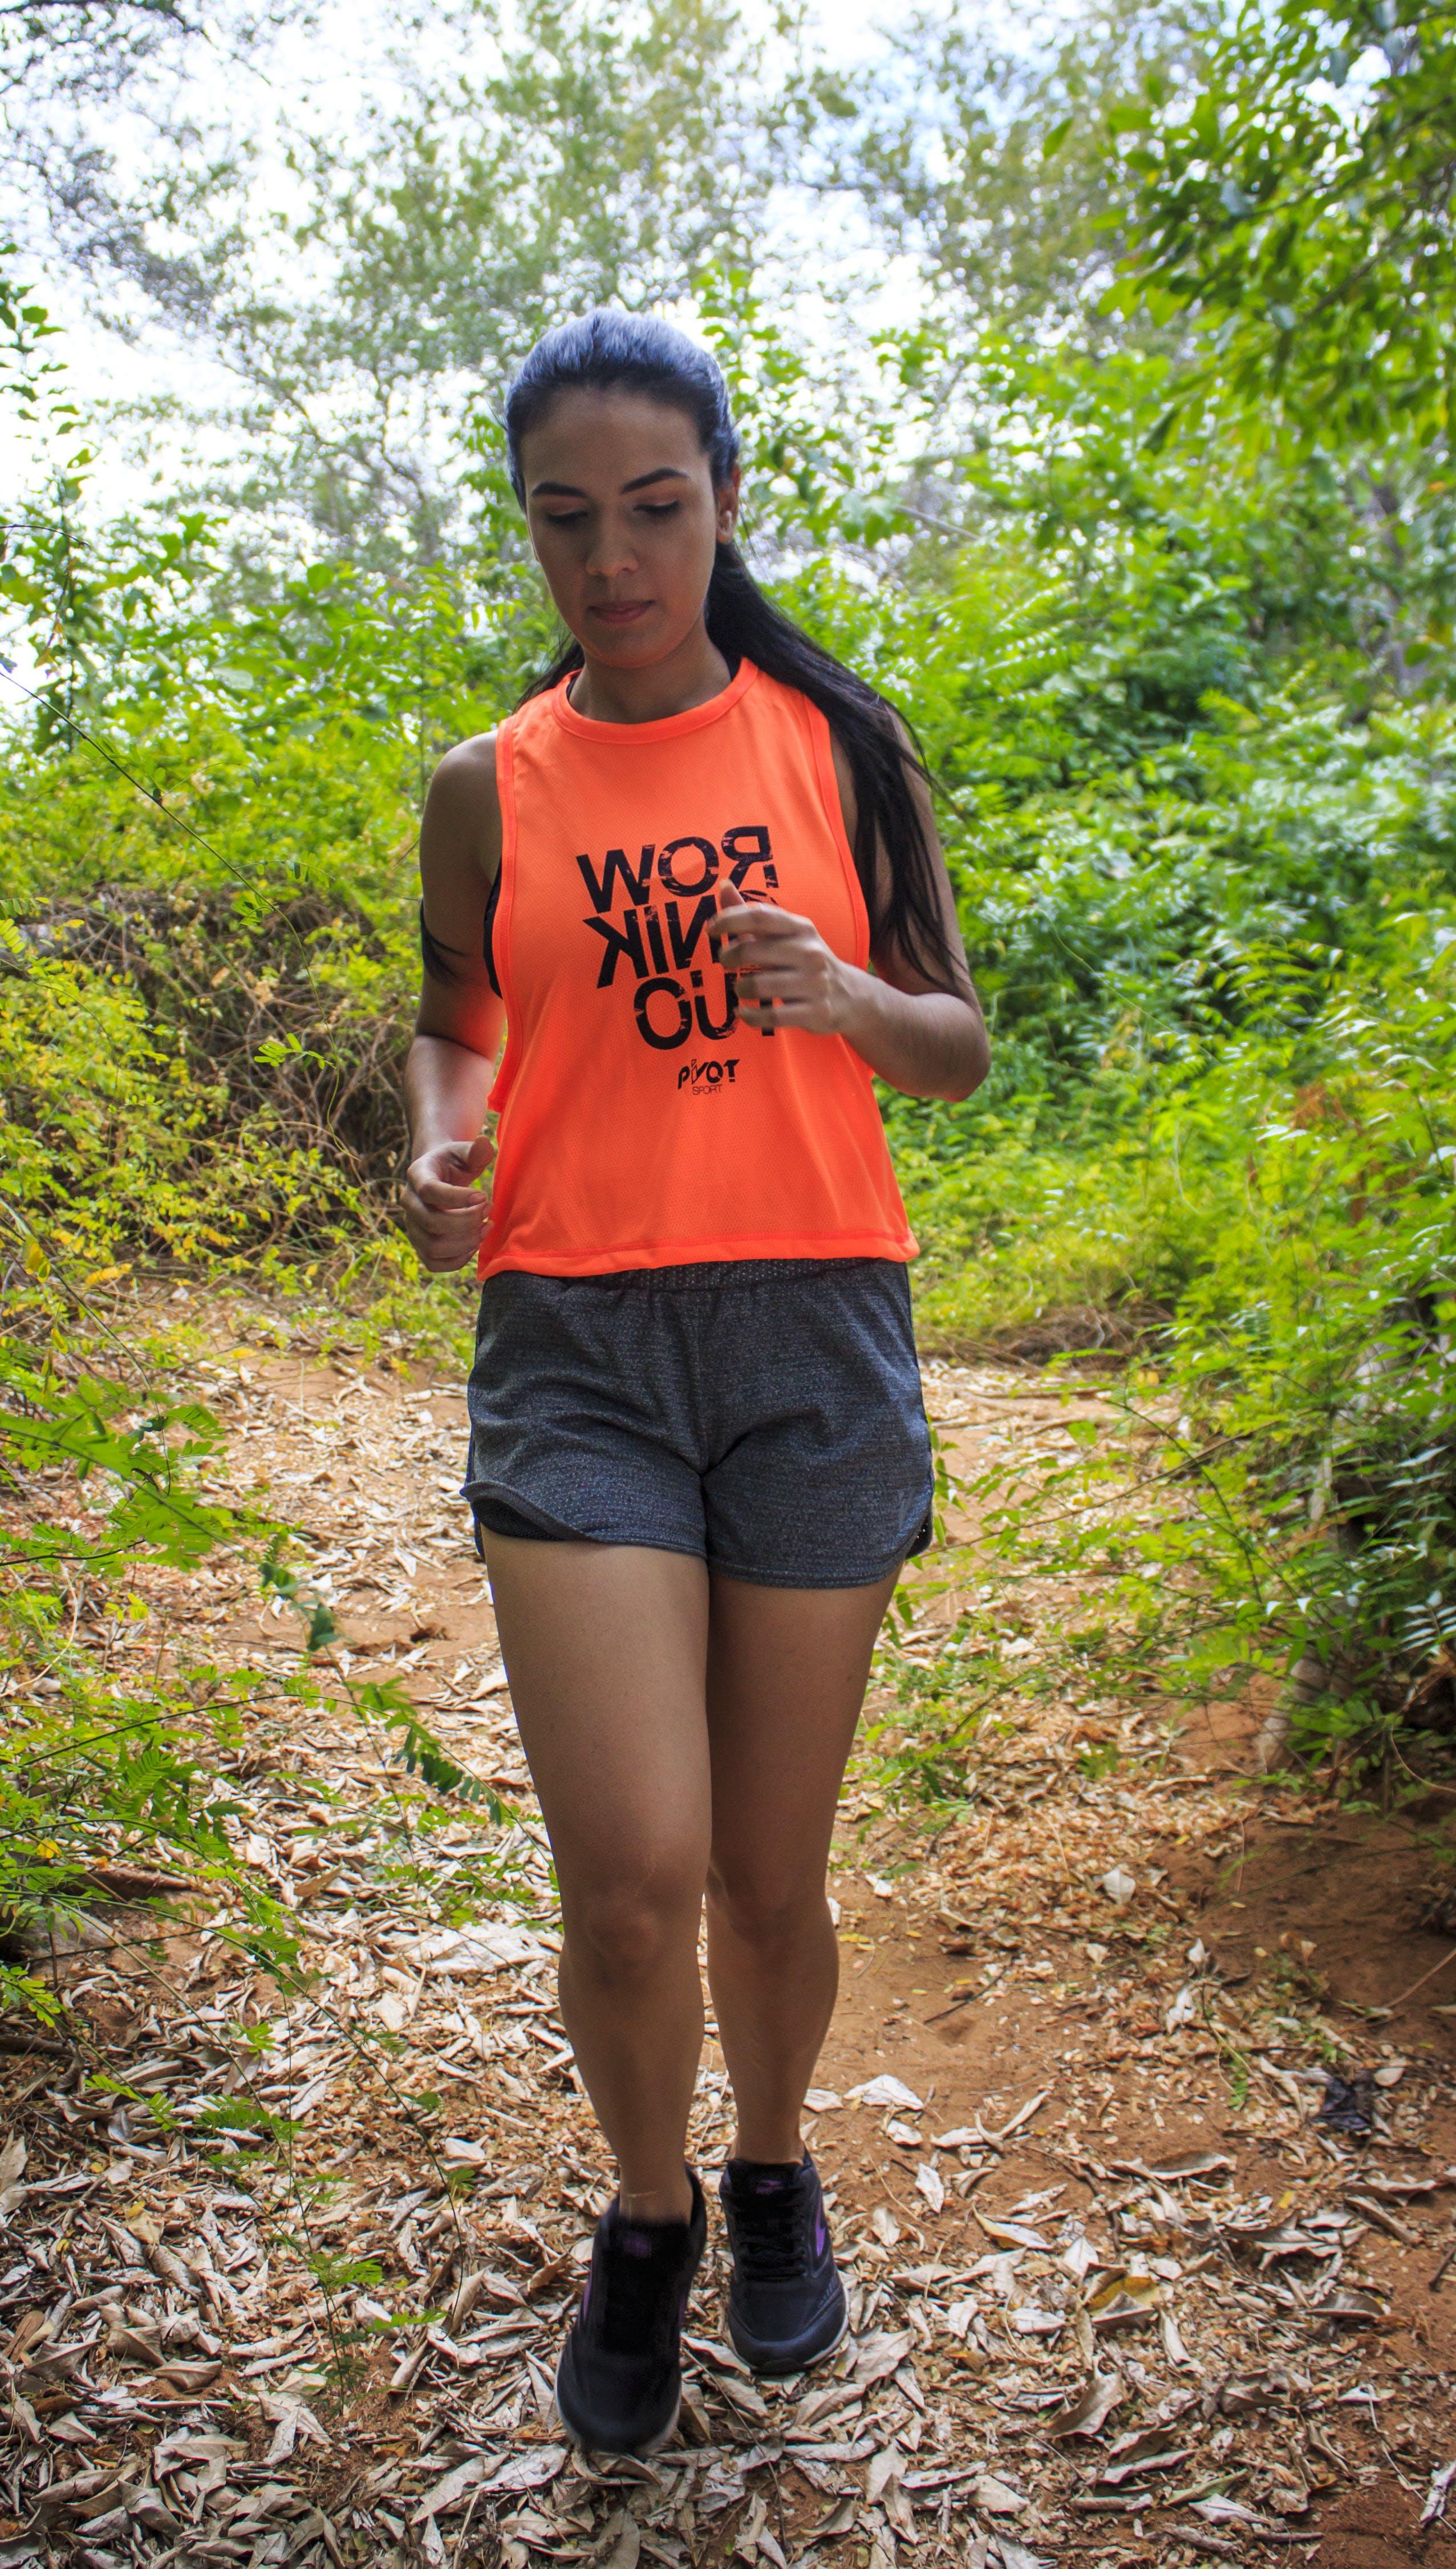 Free stock photo of fitness model, jogging, latin girl, latina